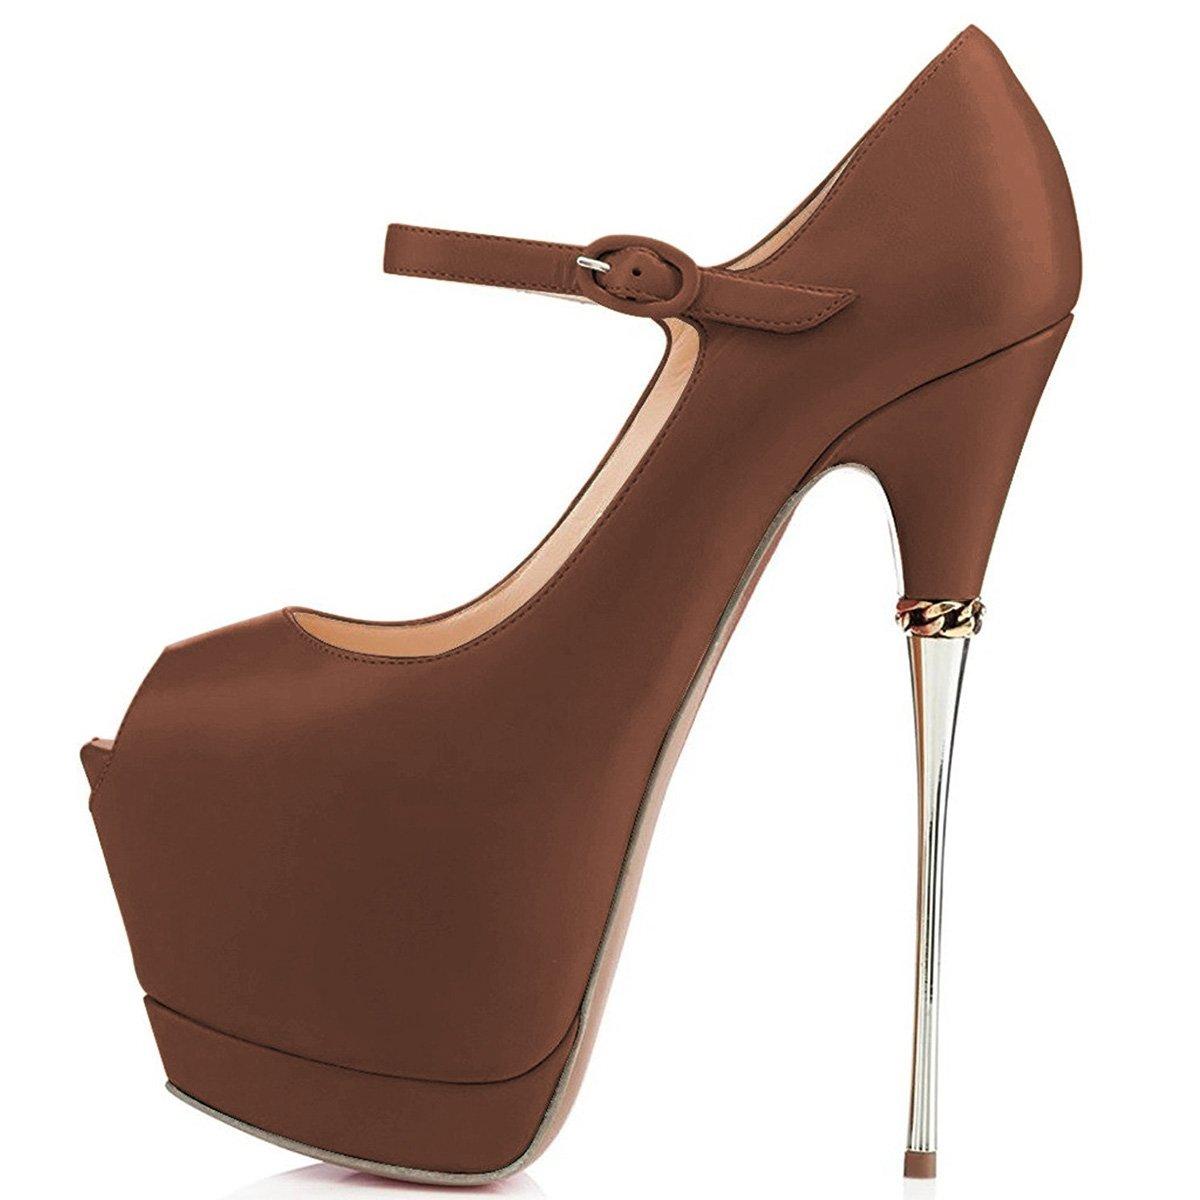 YDN Women Peep Toe Sky High Heels Platform Pumps Ankle Straps Shoes Metal Stilettos B07B7JKZB9 10 M US|Brown-pu